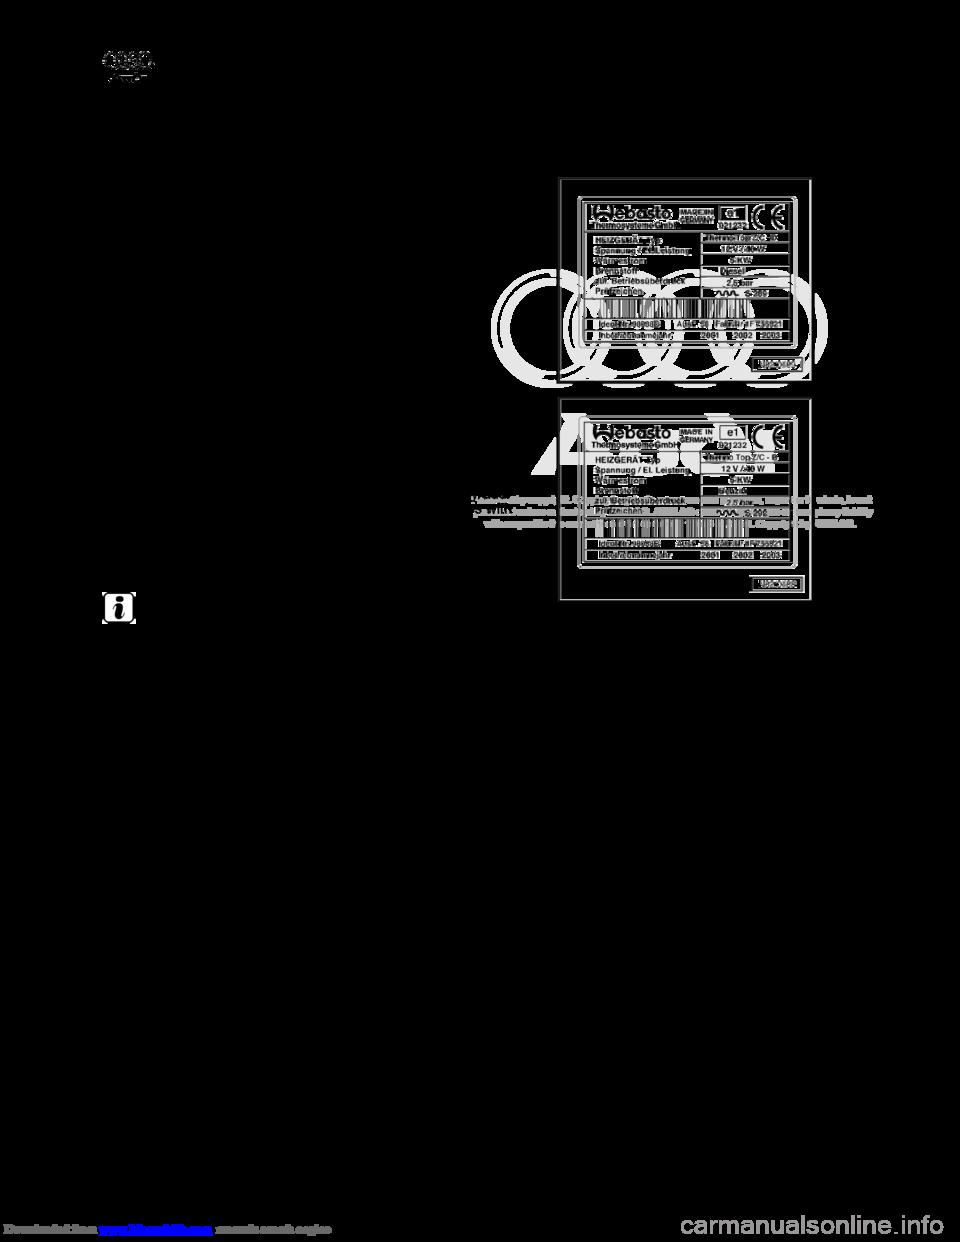 2002 toyota tacoma repair manual